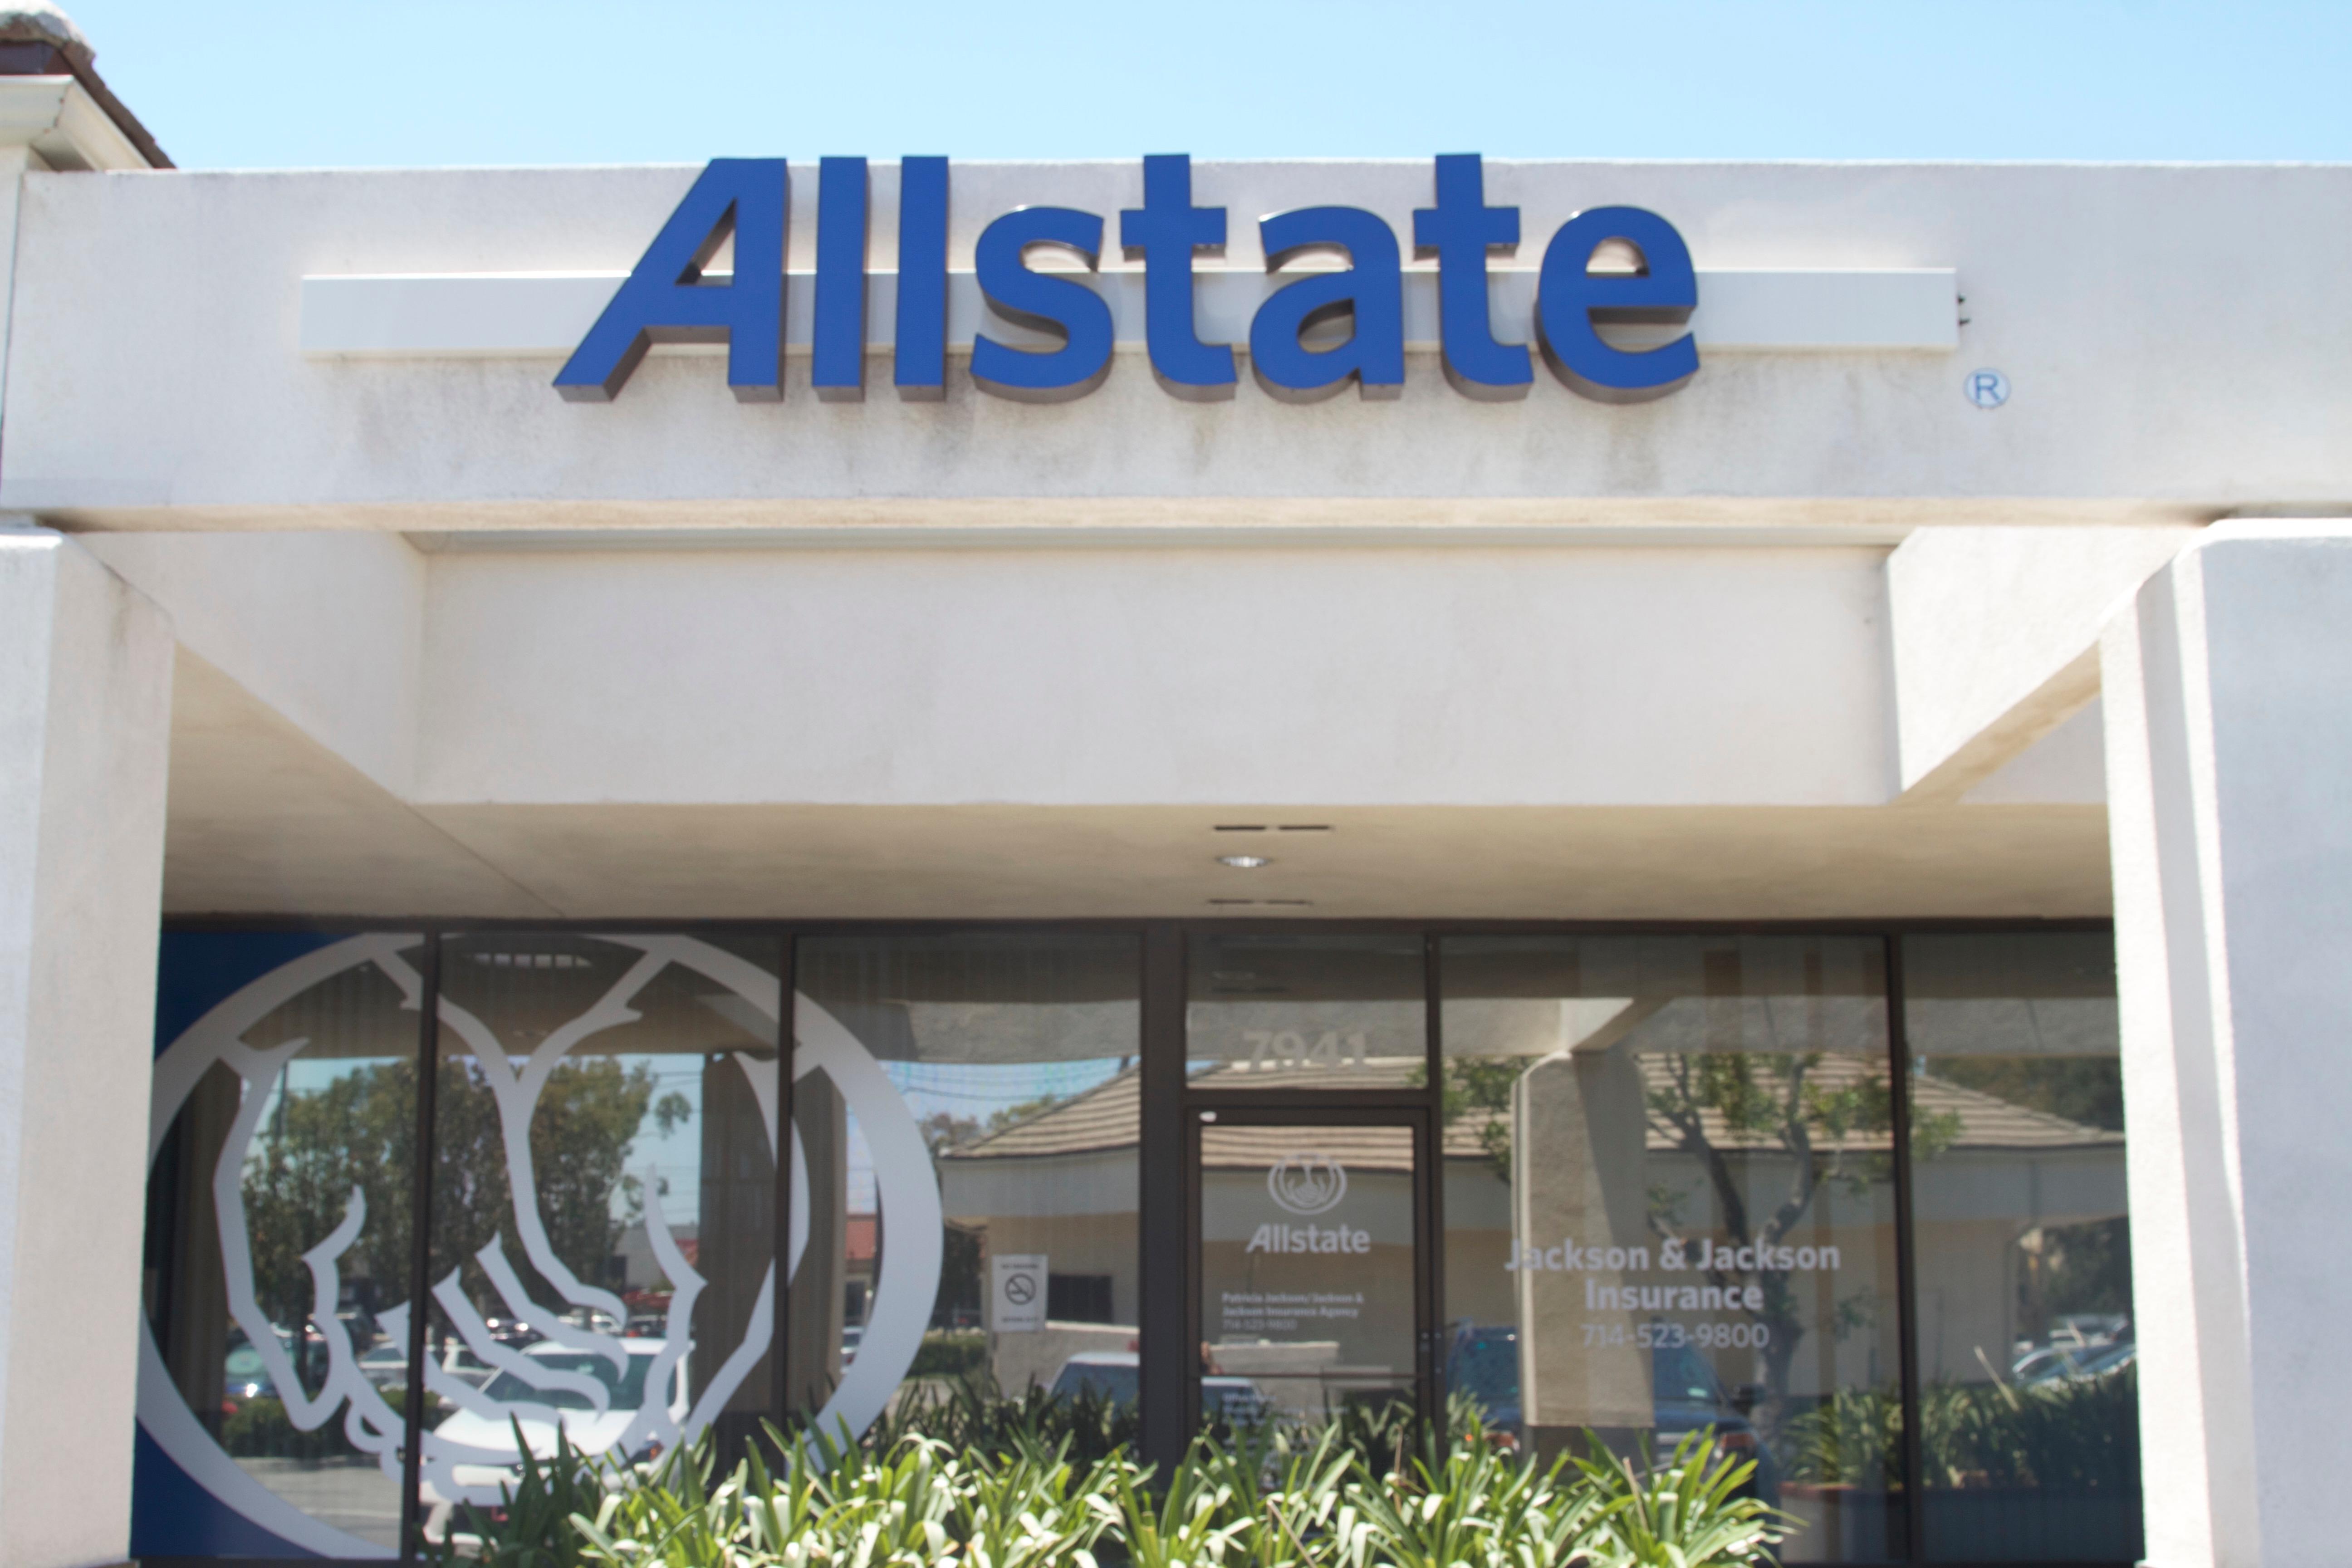 Patricia Jackson: Allstate Insurance image 1